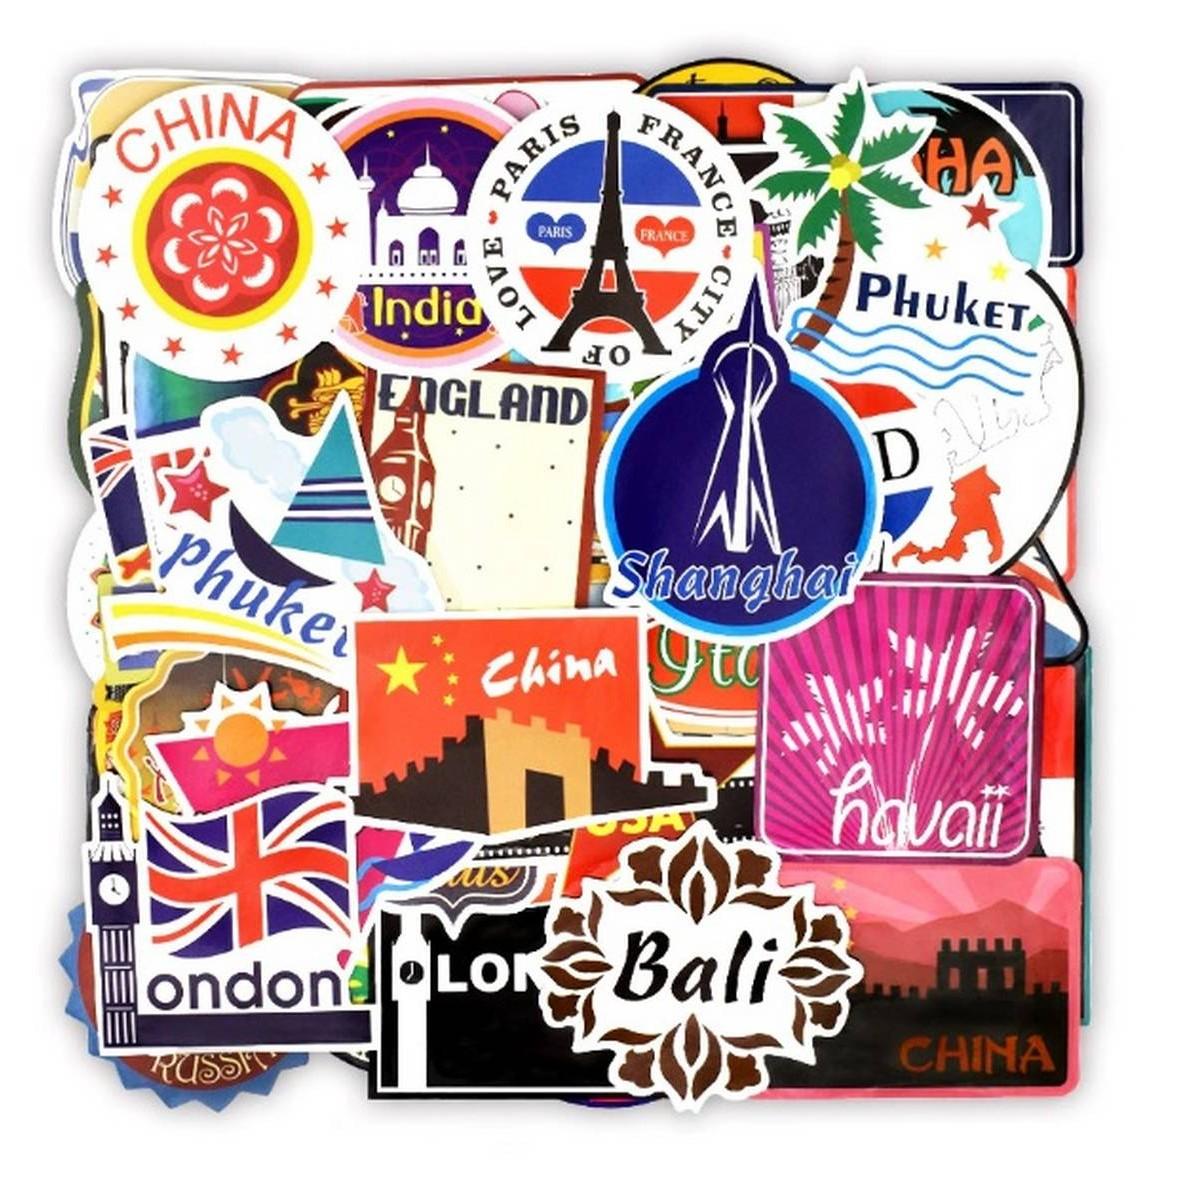 10 Pcs/Pack Retro Traveling World Cities Historical Places Graffiti Waterproof Stickers for Laptop Mobile Cover Guitar Bike Car Fridge Skateboard PC AC TV Helmet Mac